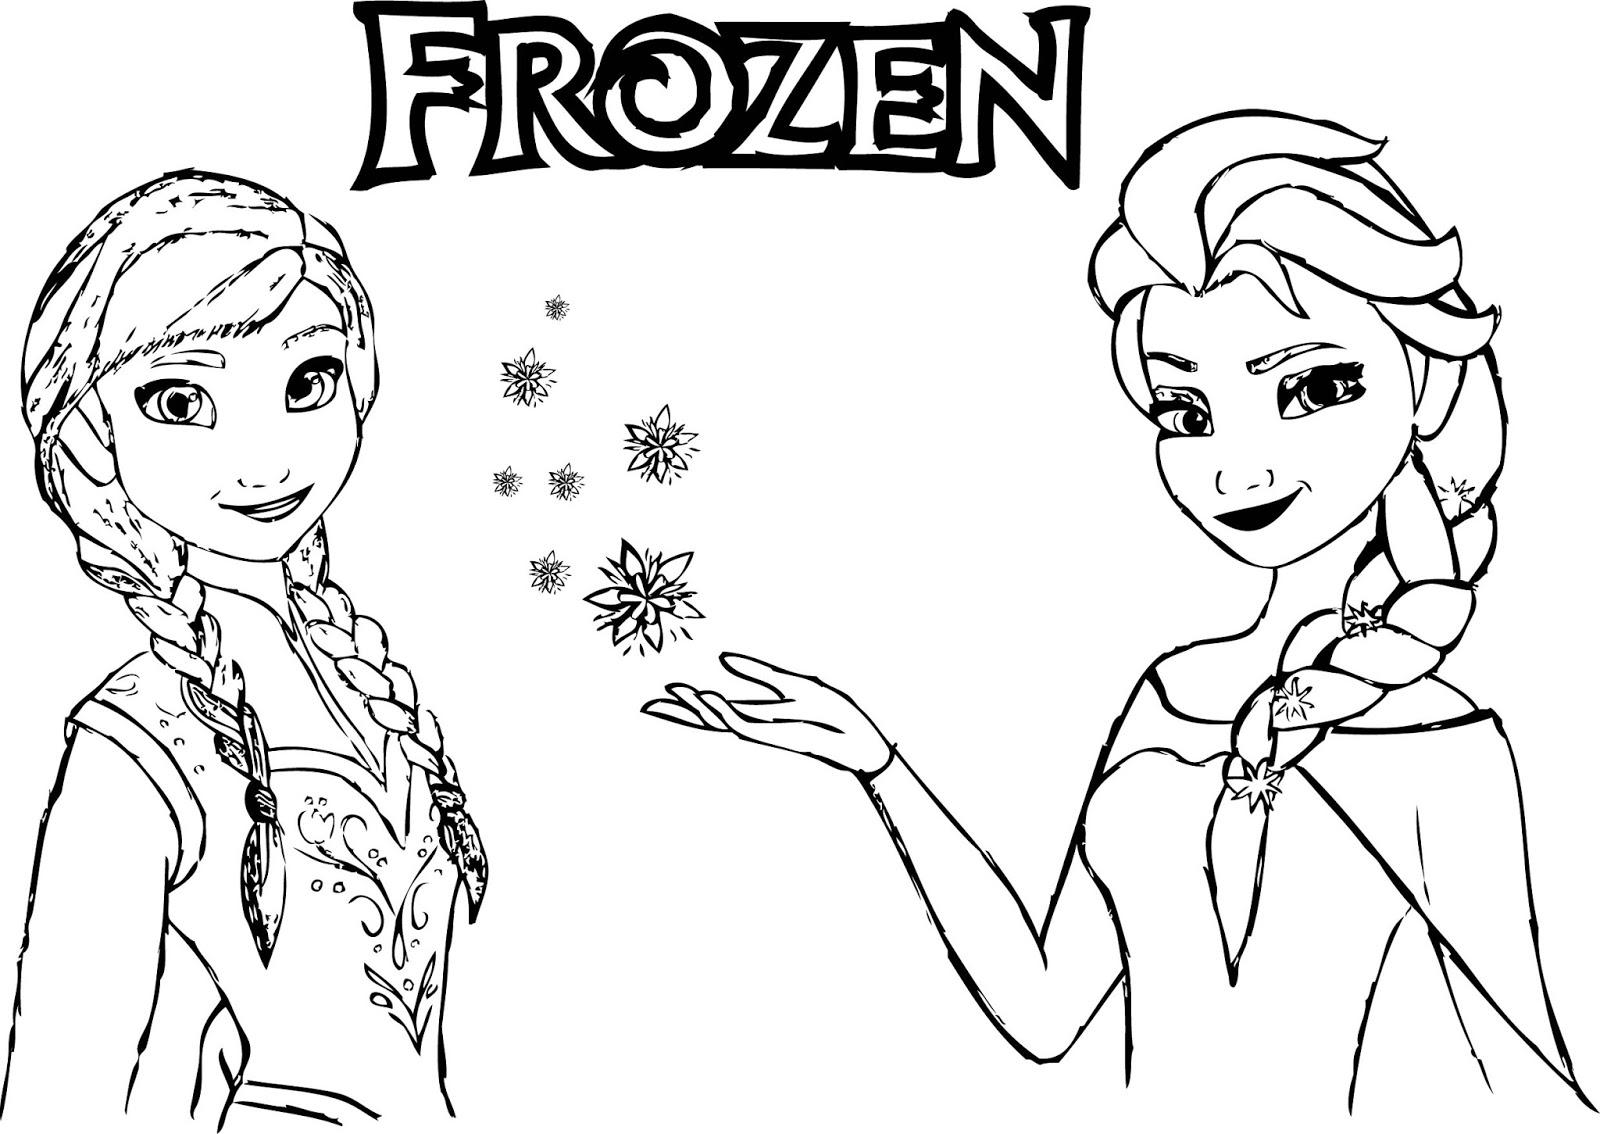 elsa and anna coloring pages to print - aprende brincando frozen colorir a anna e a elsa